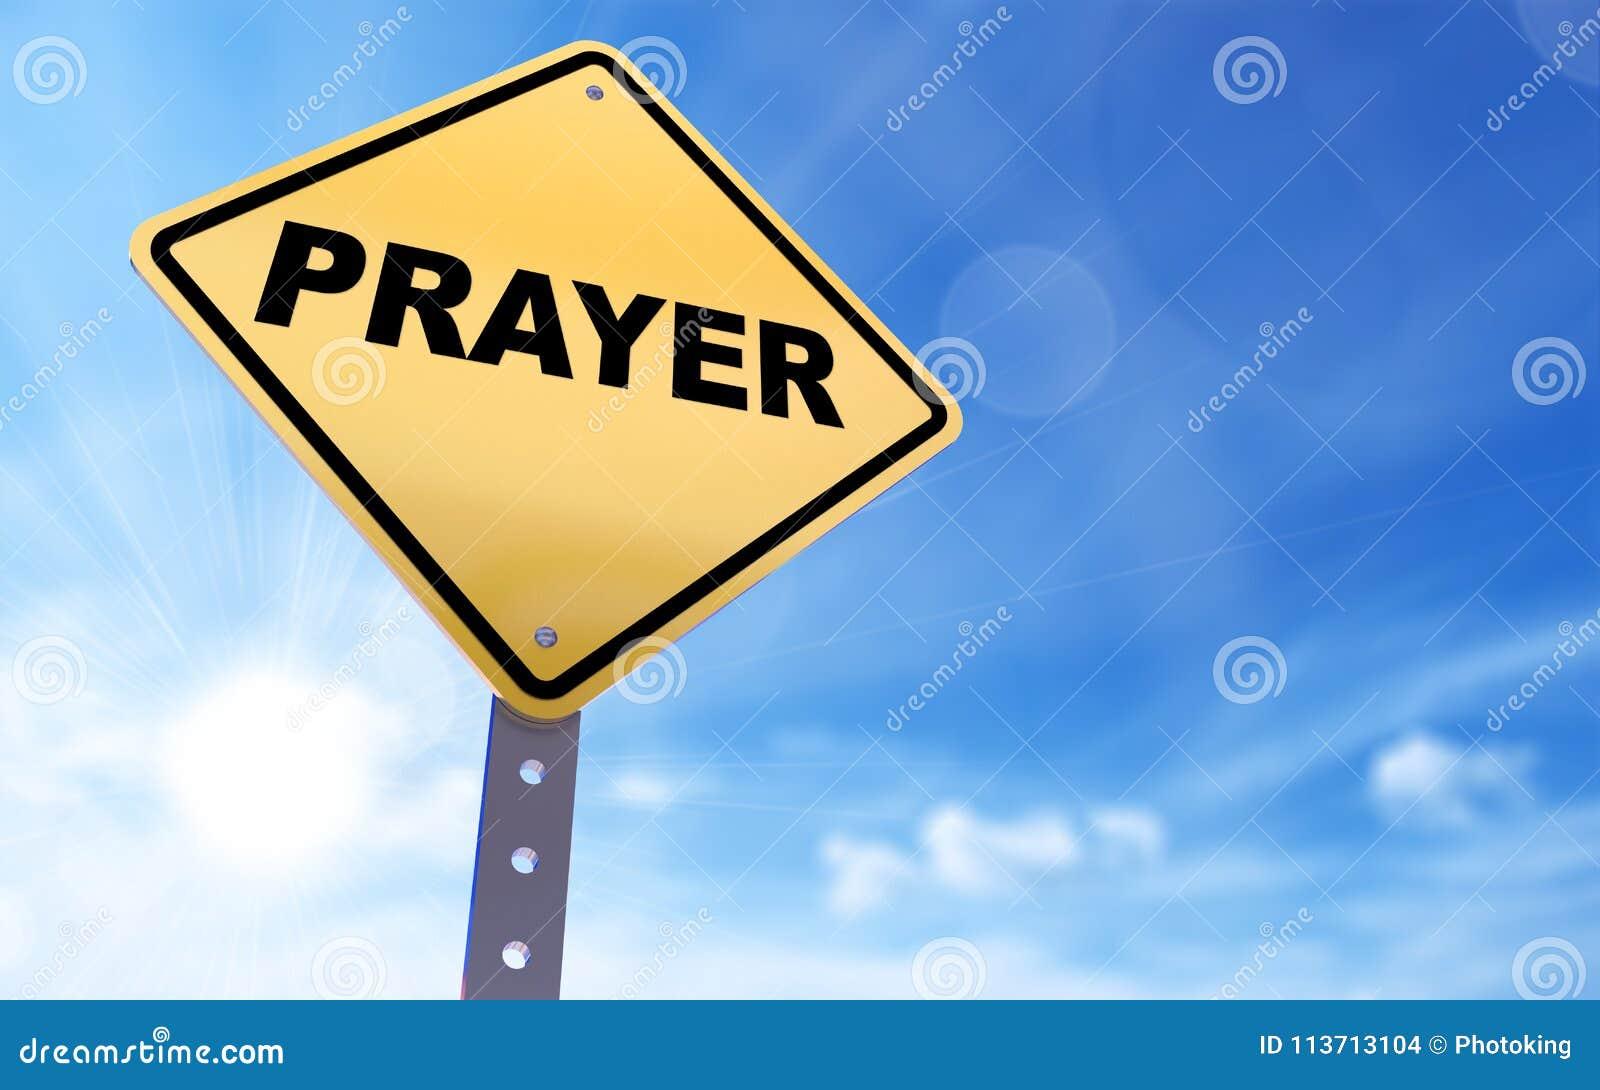 Prayer sign